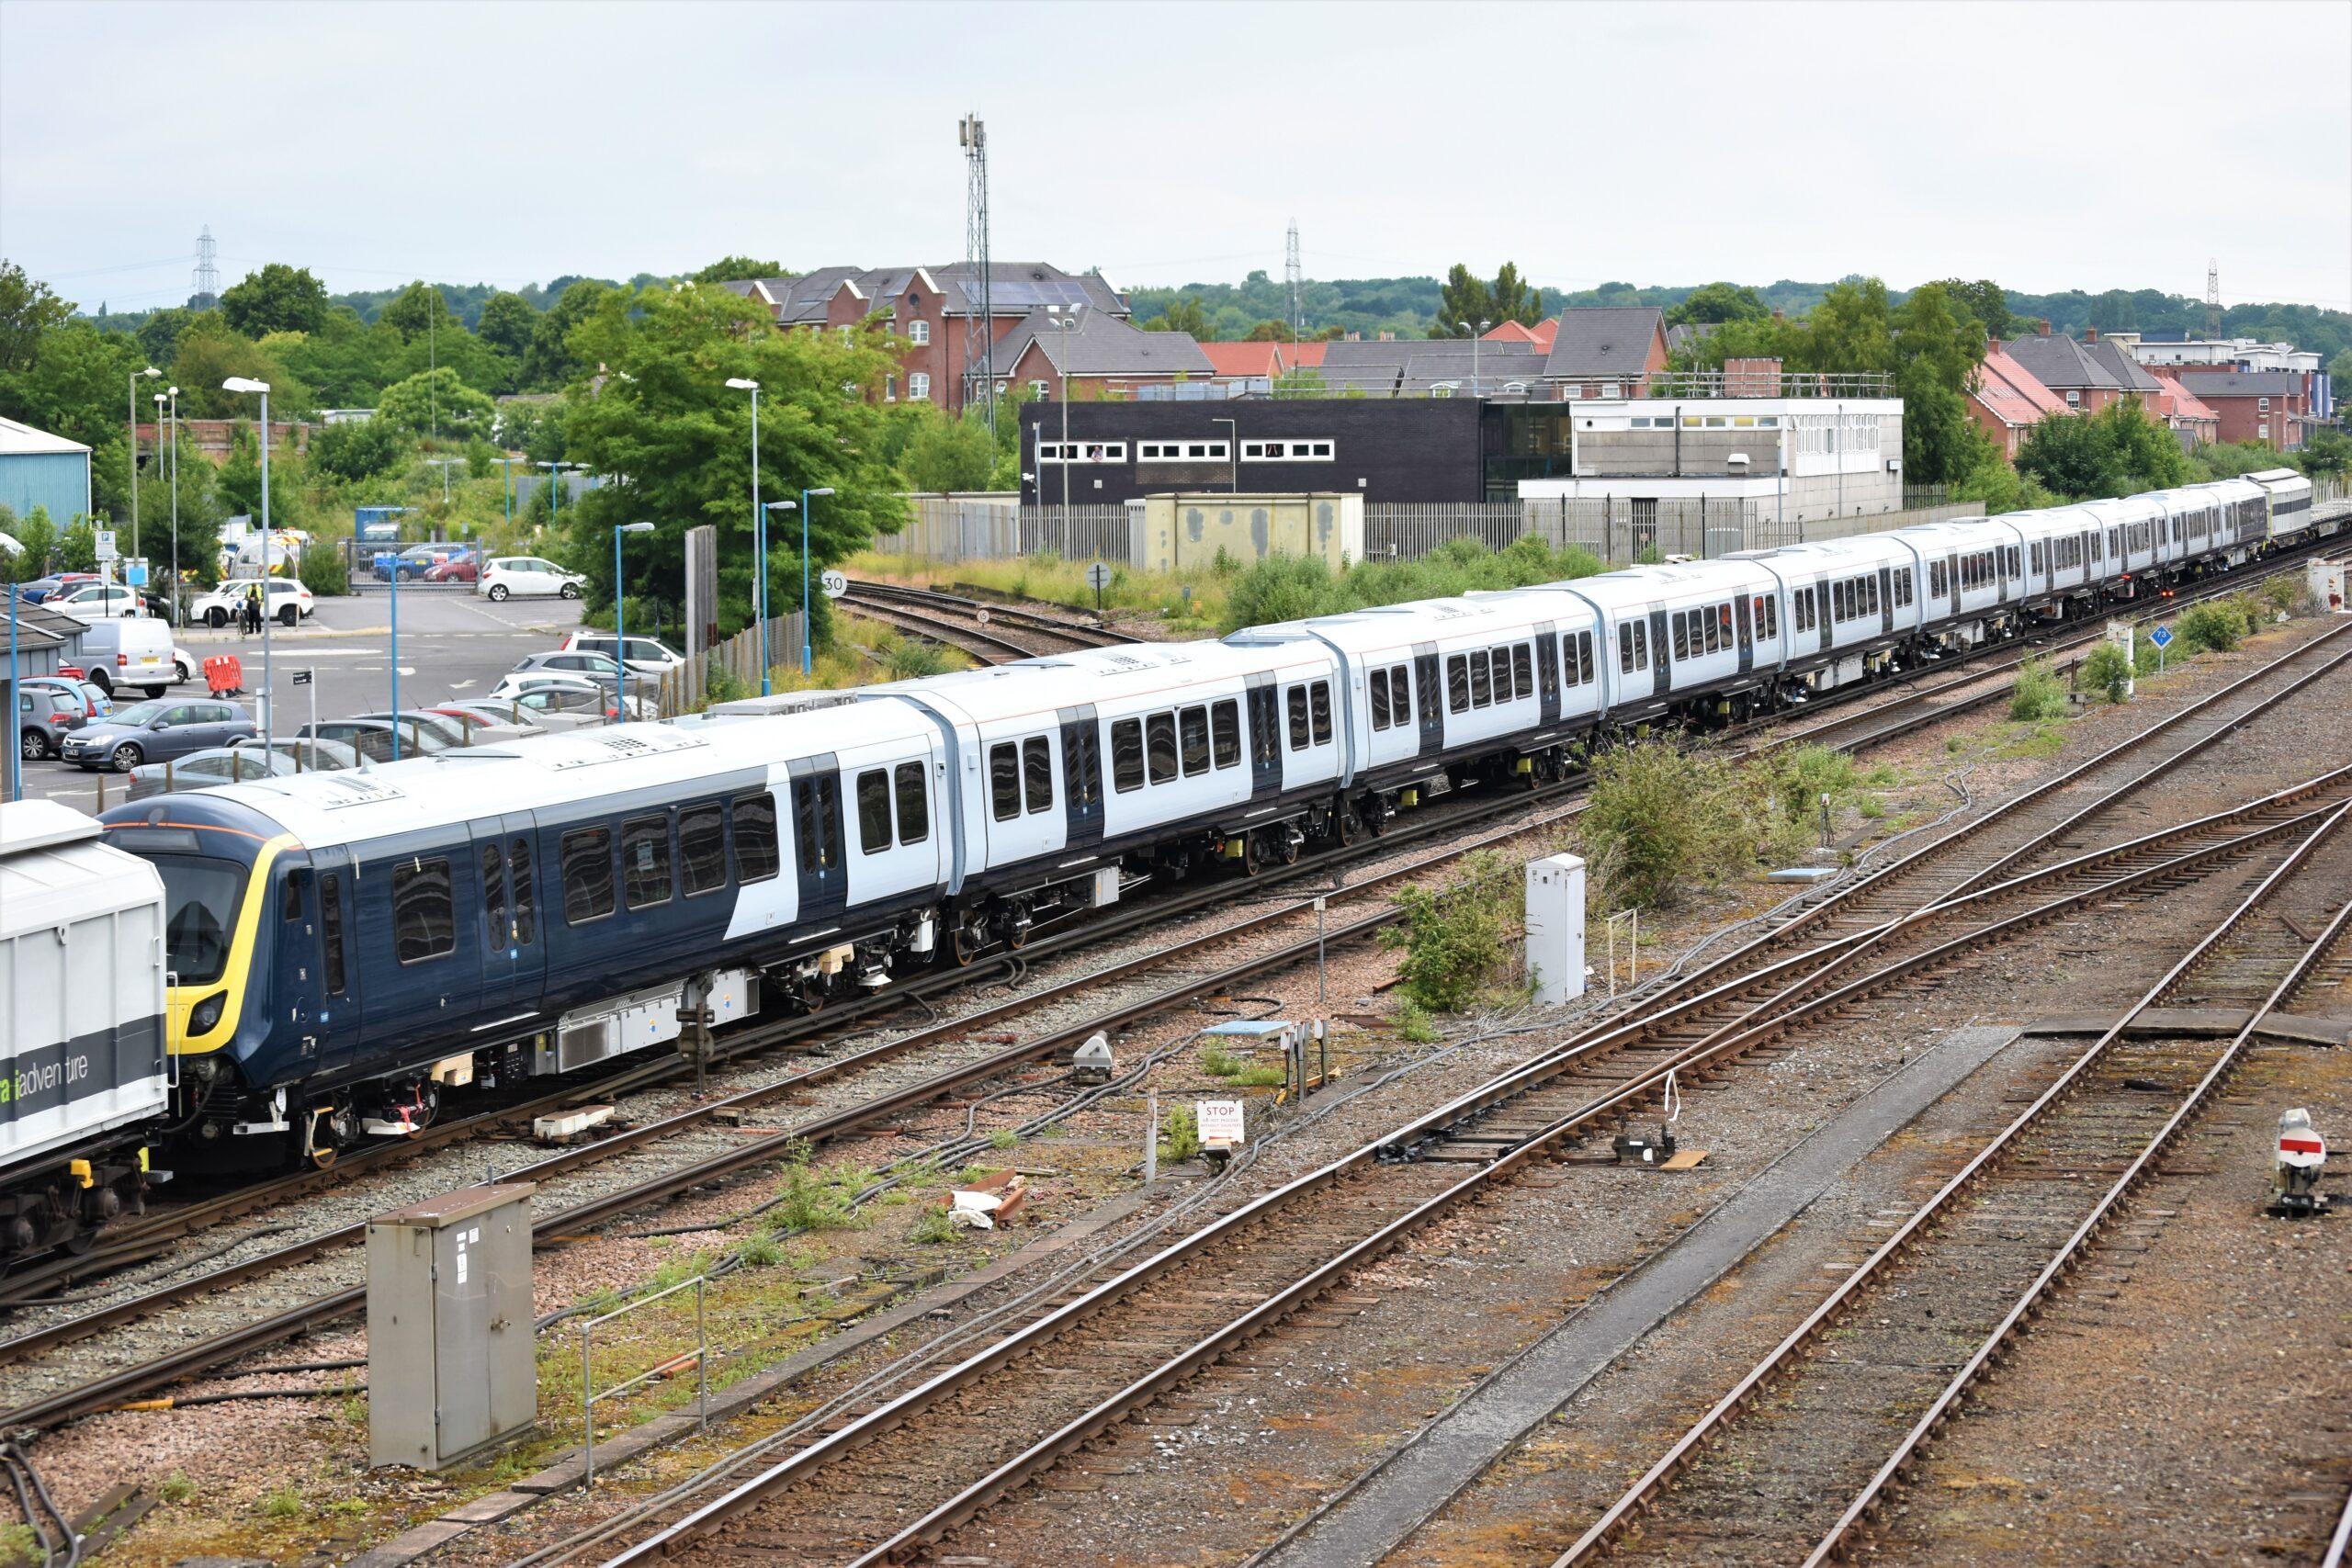 SWR Class 701 Aventra EMU